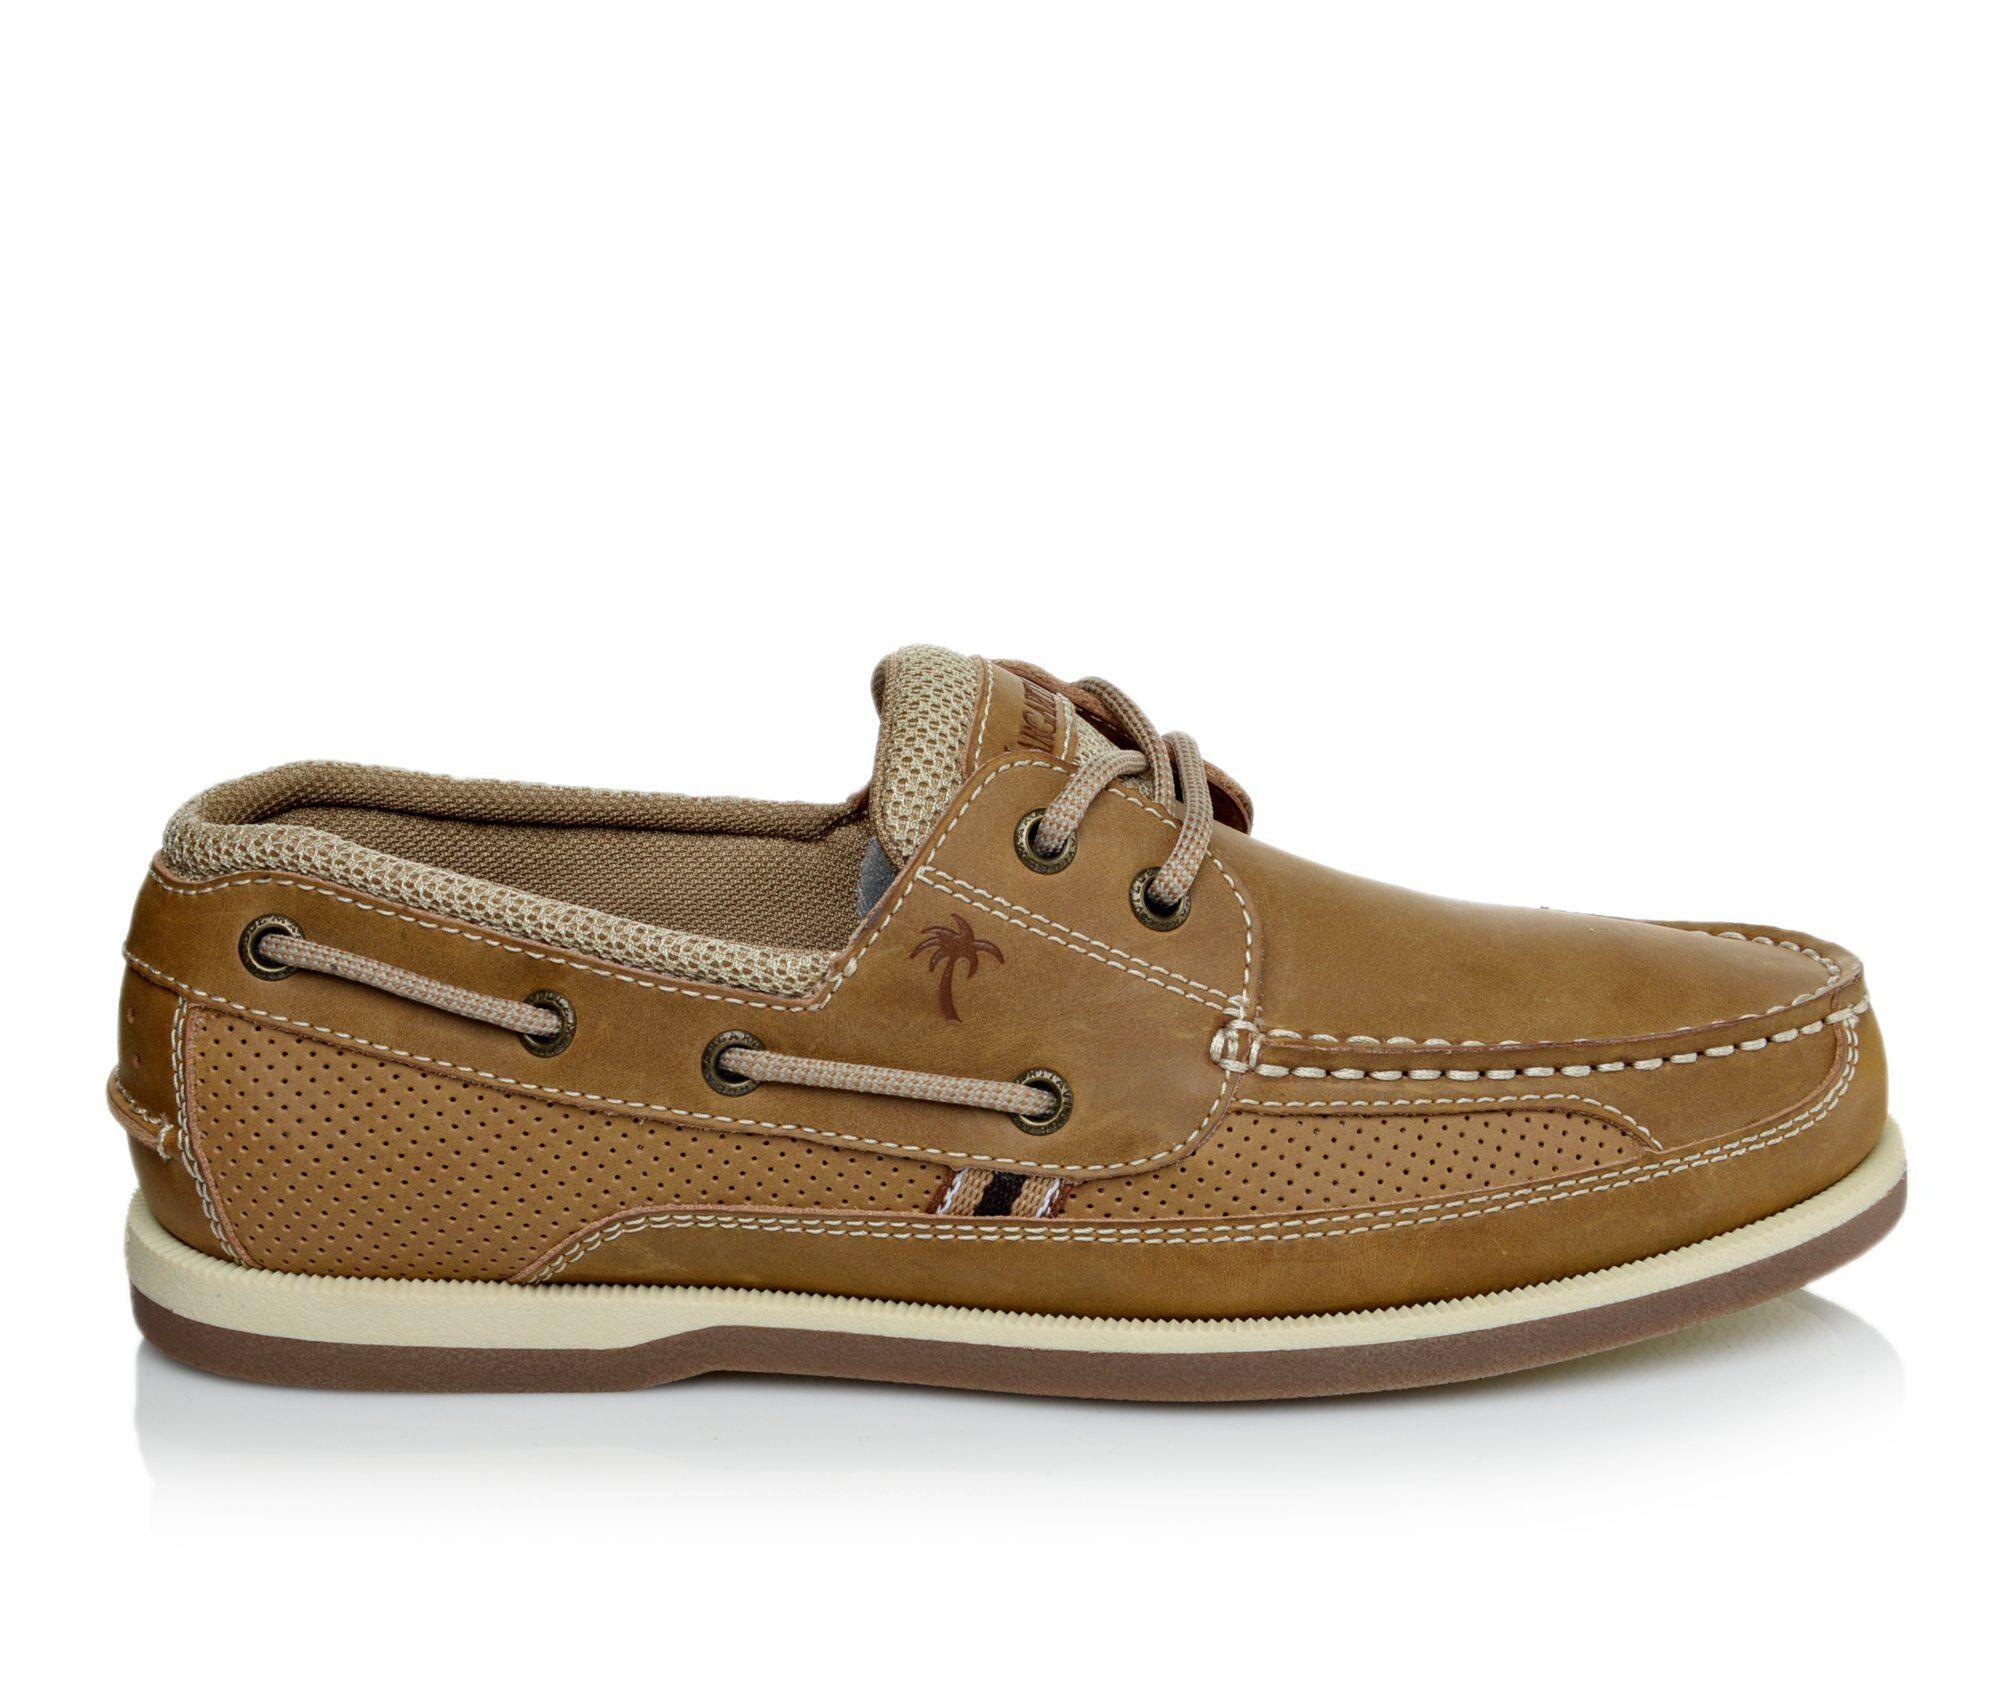 Men's Margaritaville Lighthouse Boat Shoes Tan